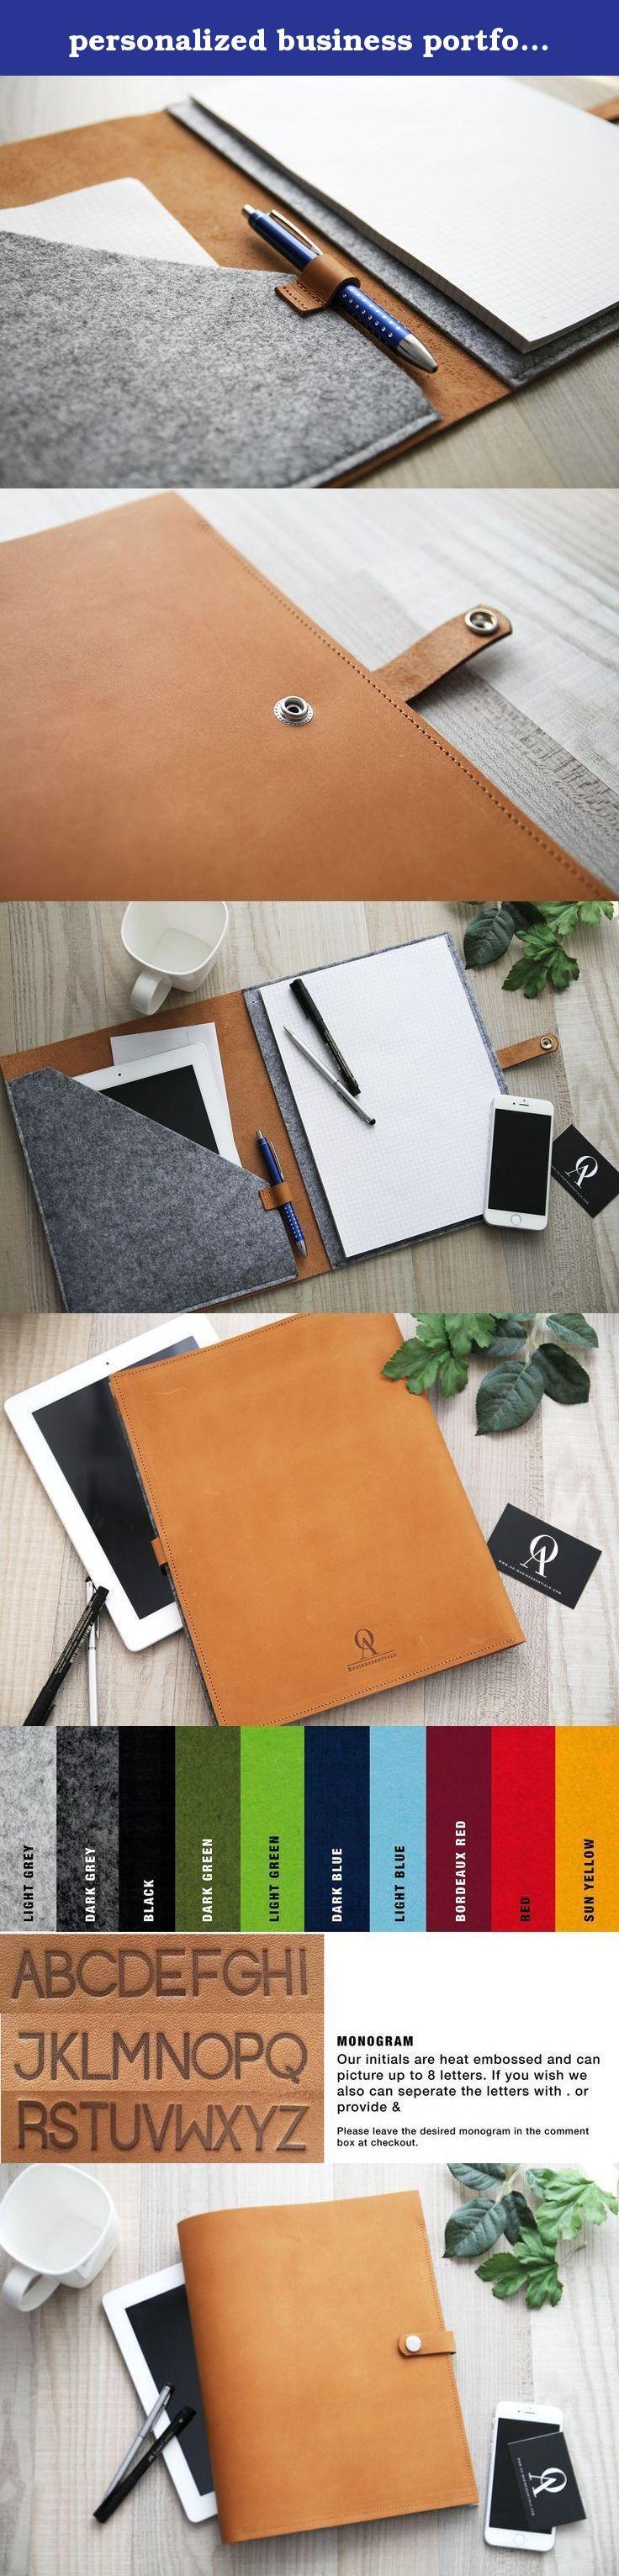 resume folders amp x envelopes shop southworth for the babbler kate spade hidden meanings file folders